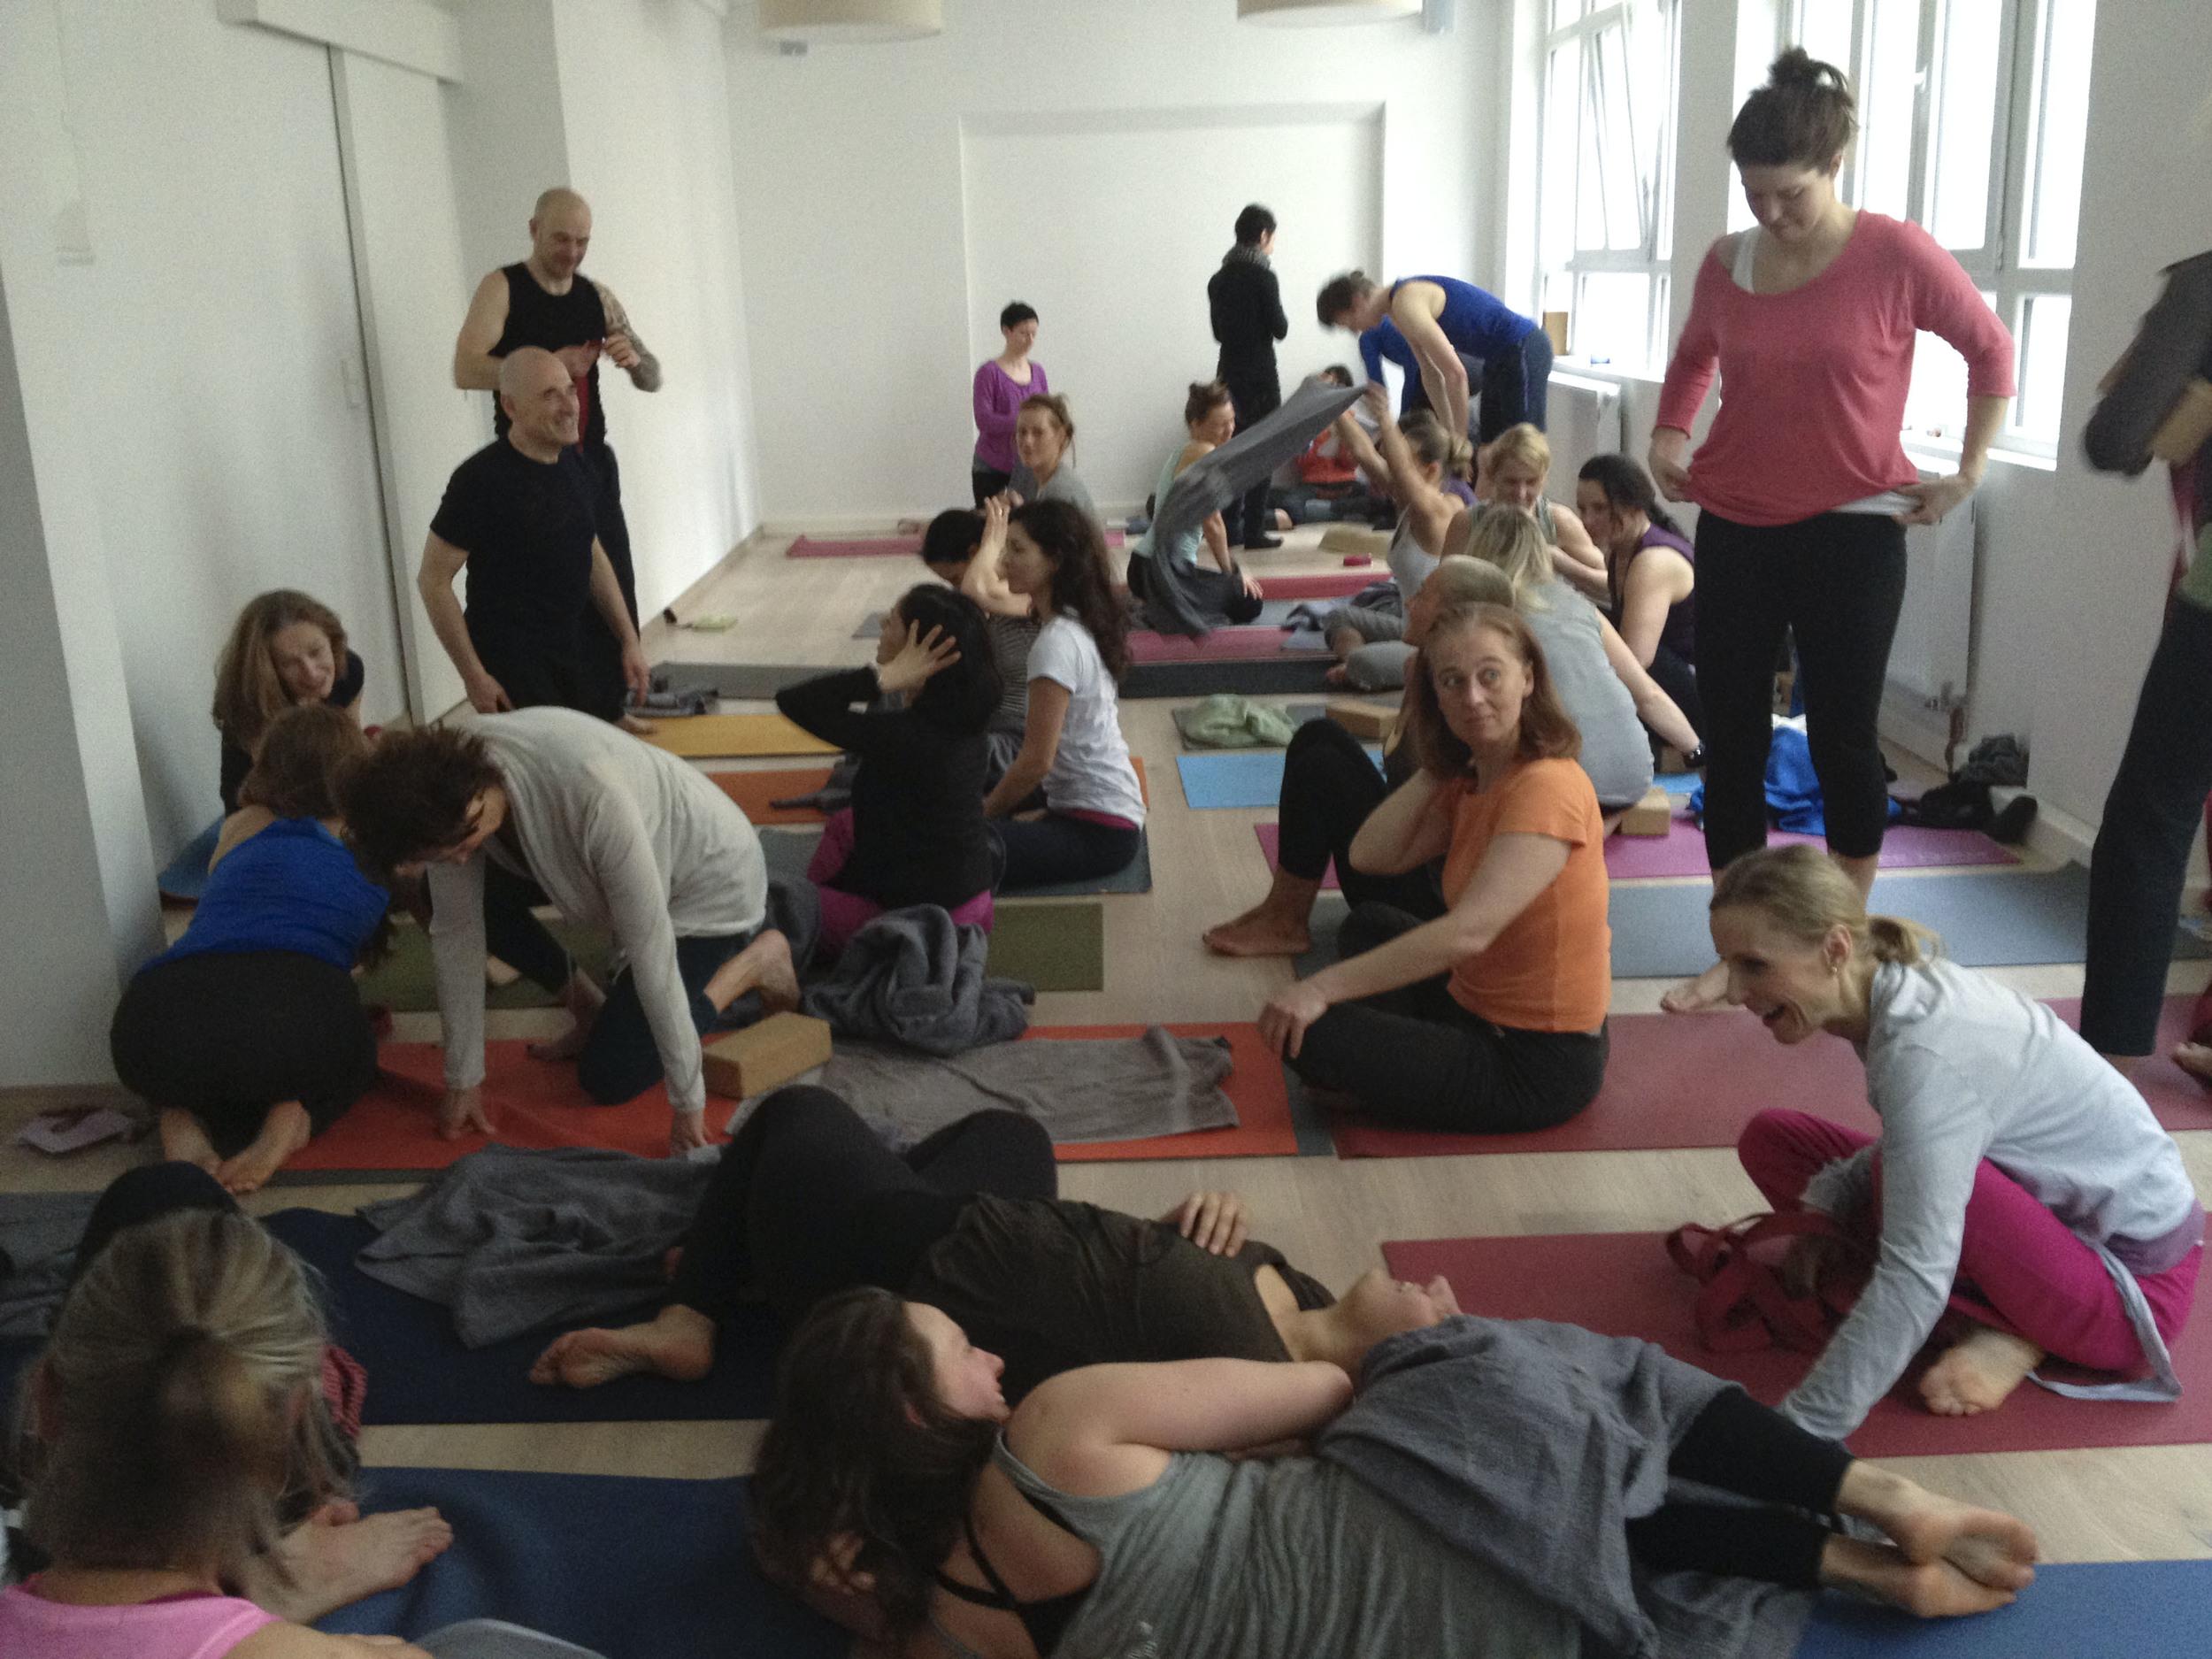 yoga studio stuttgart yoga loft772.jpg